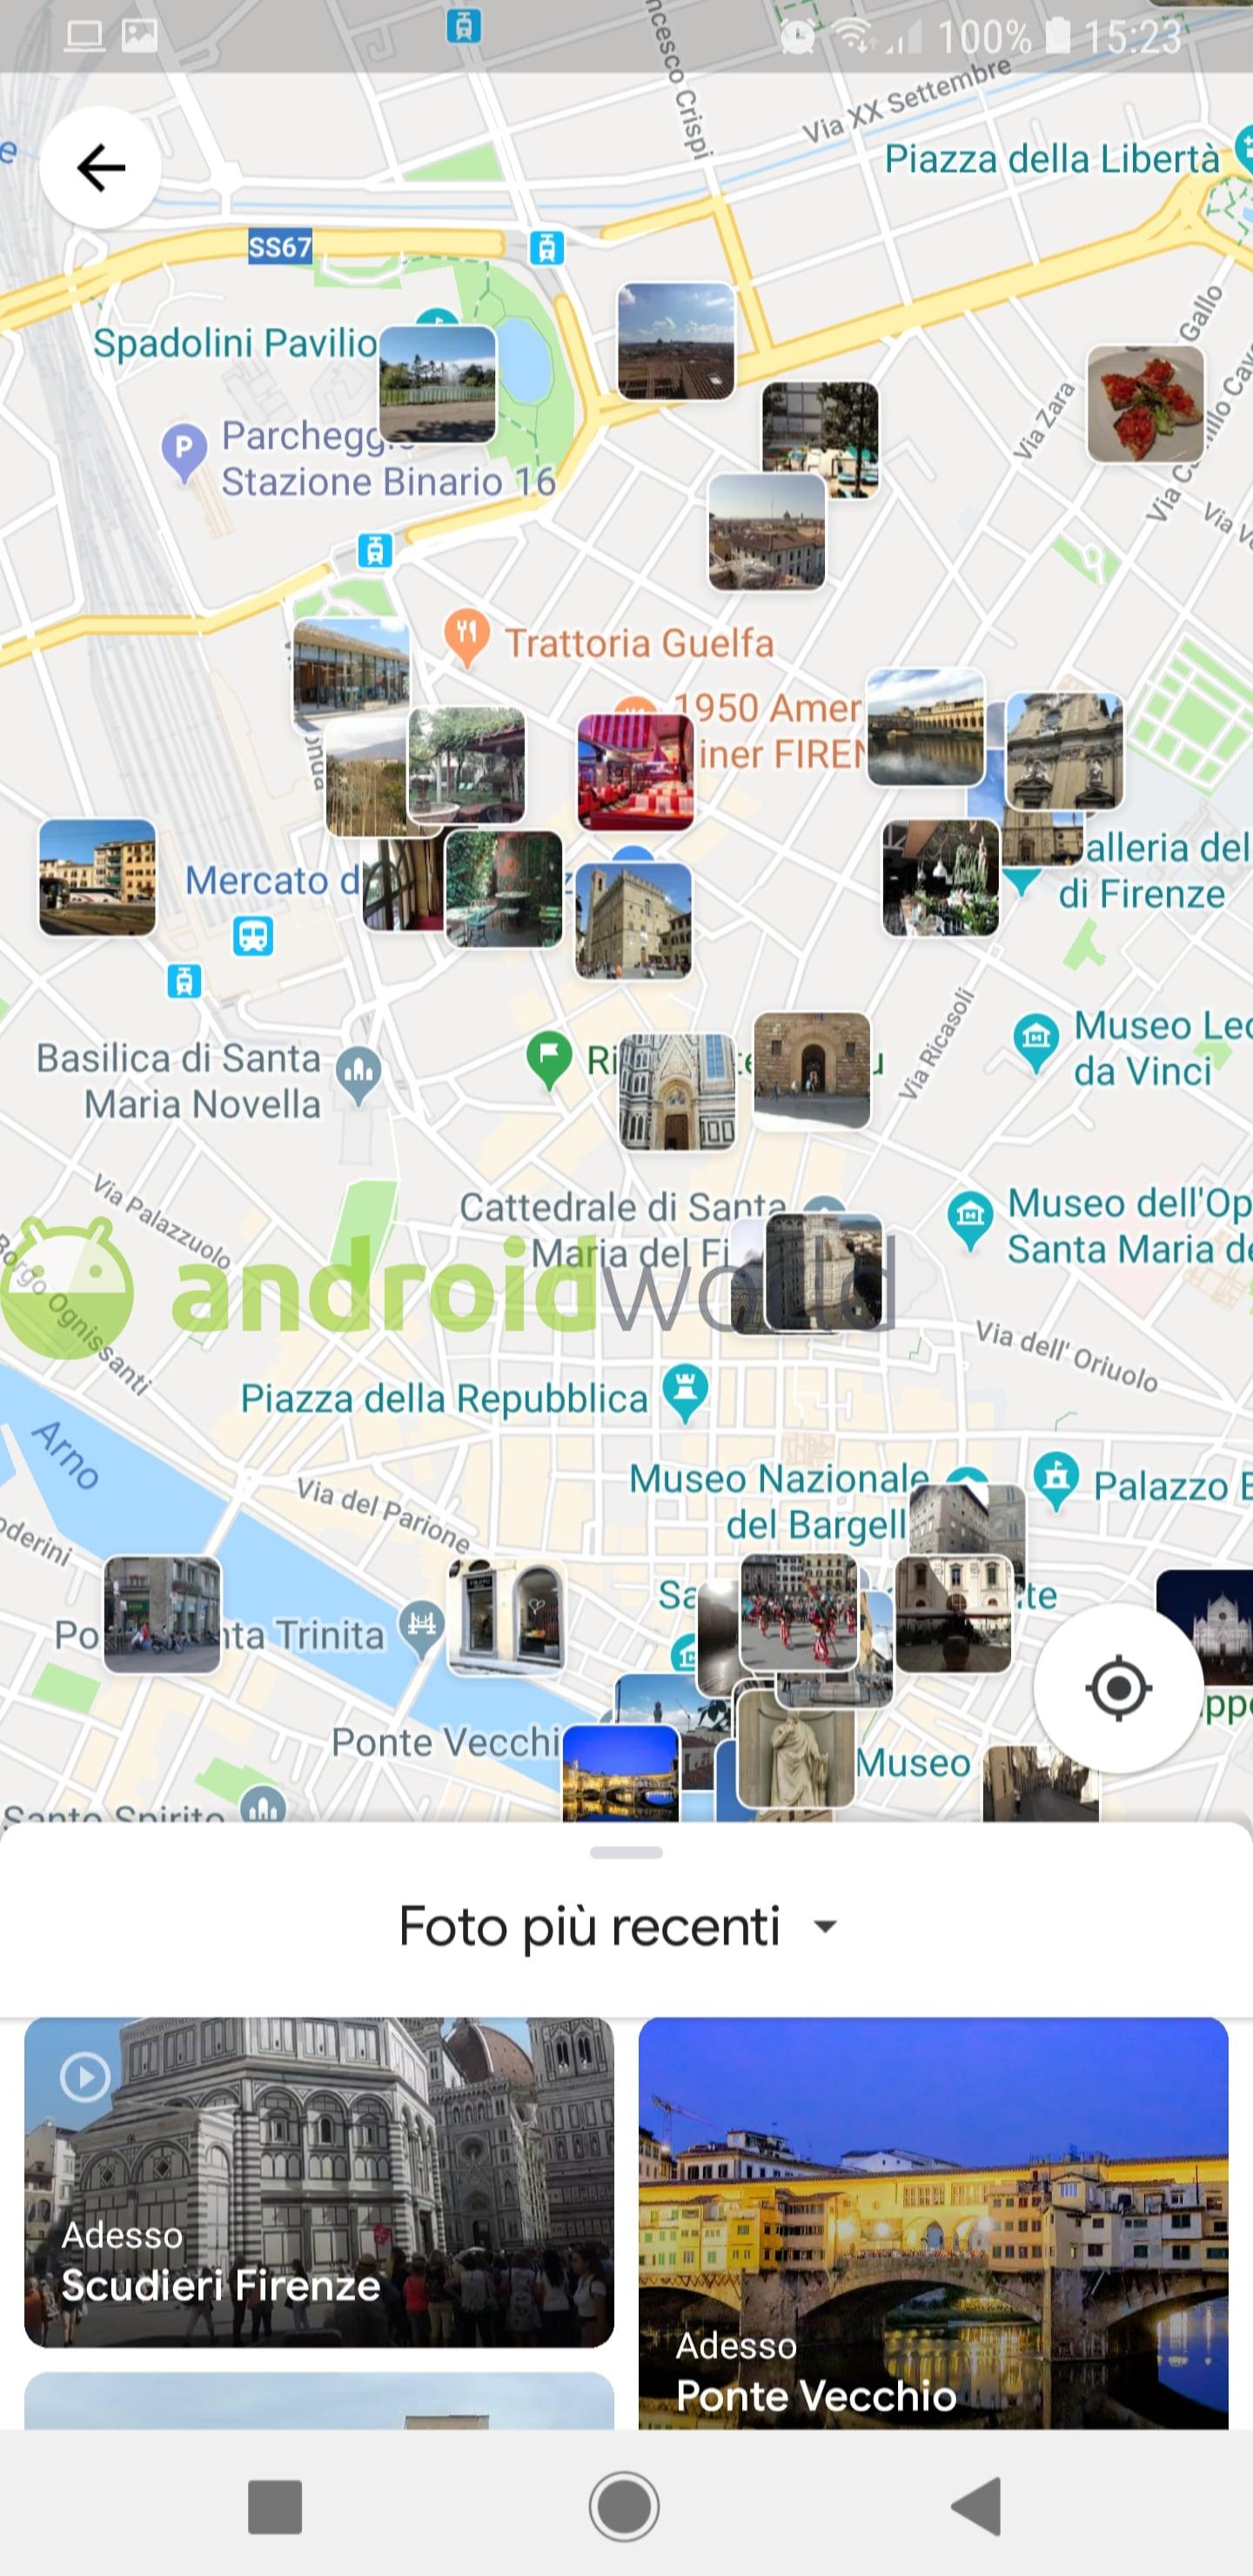 google-maps-photos (1)